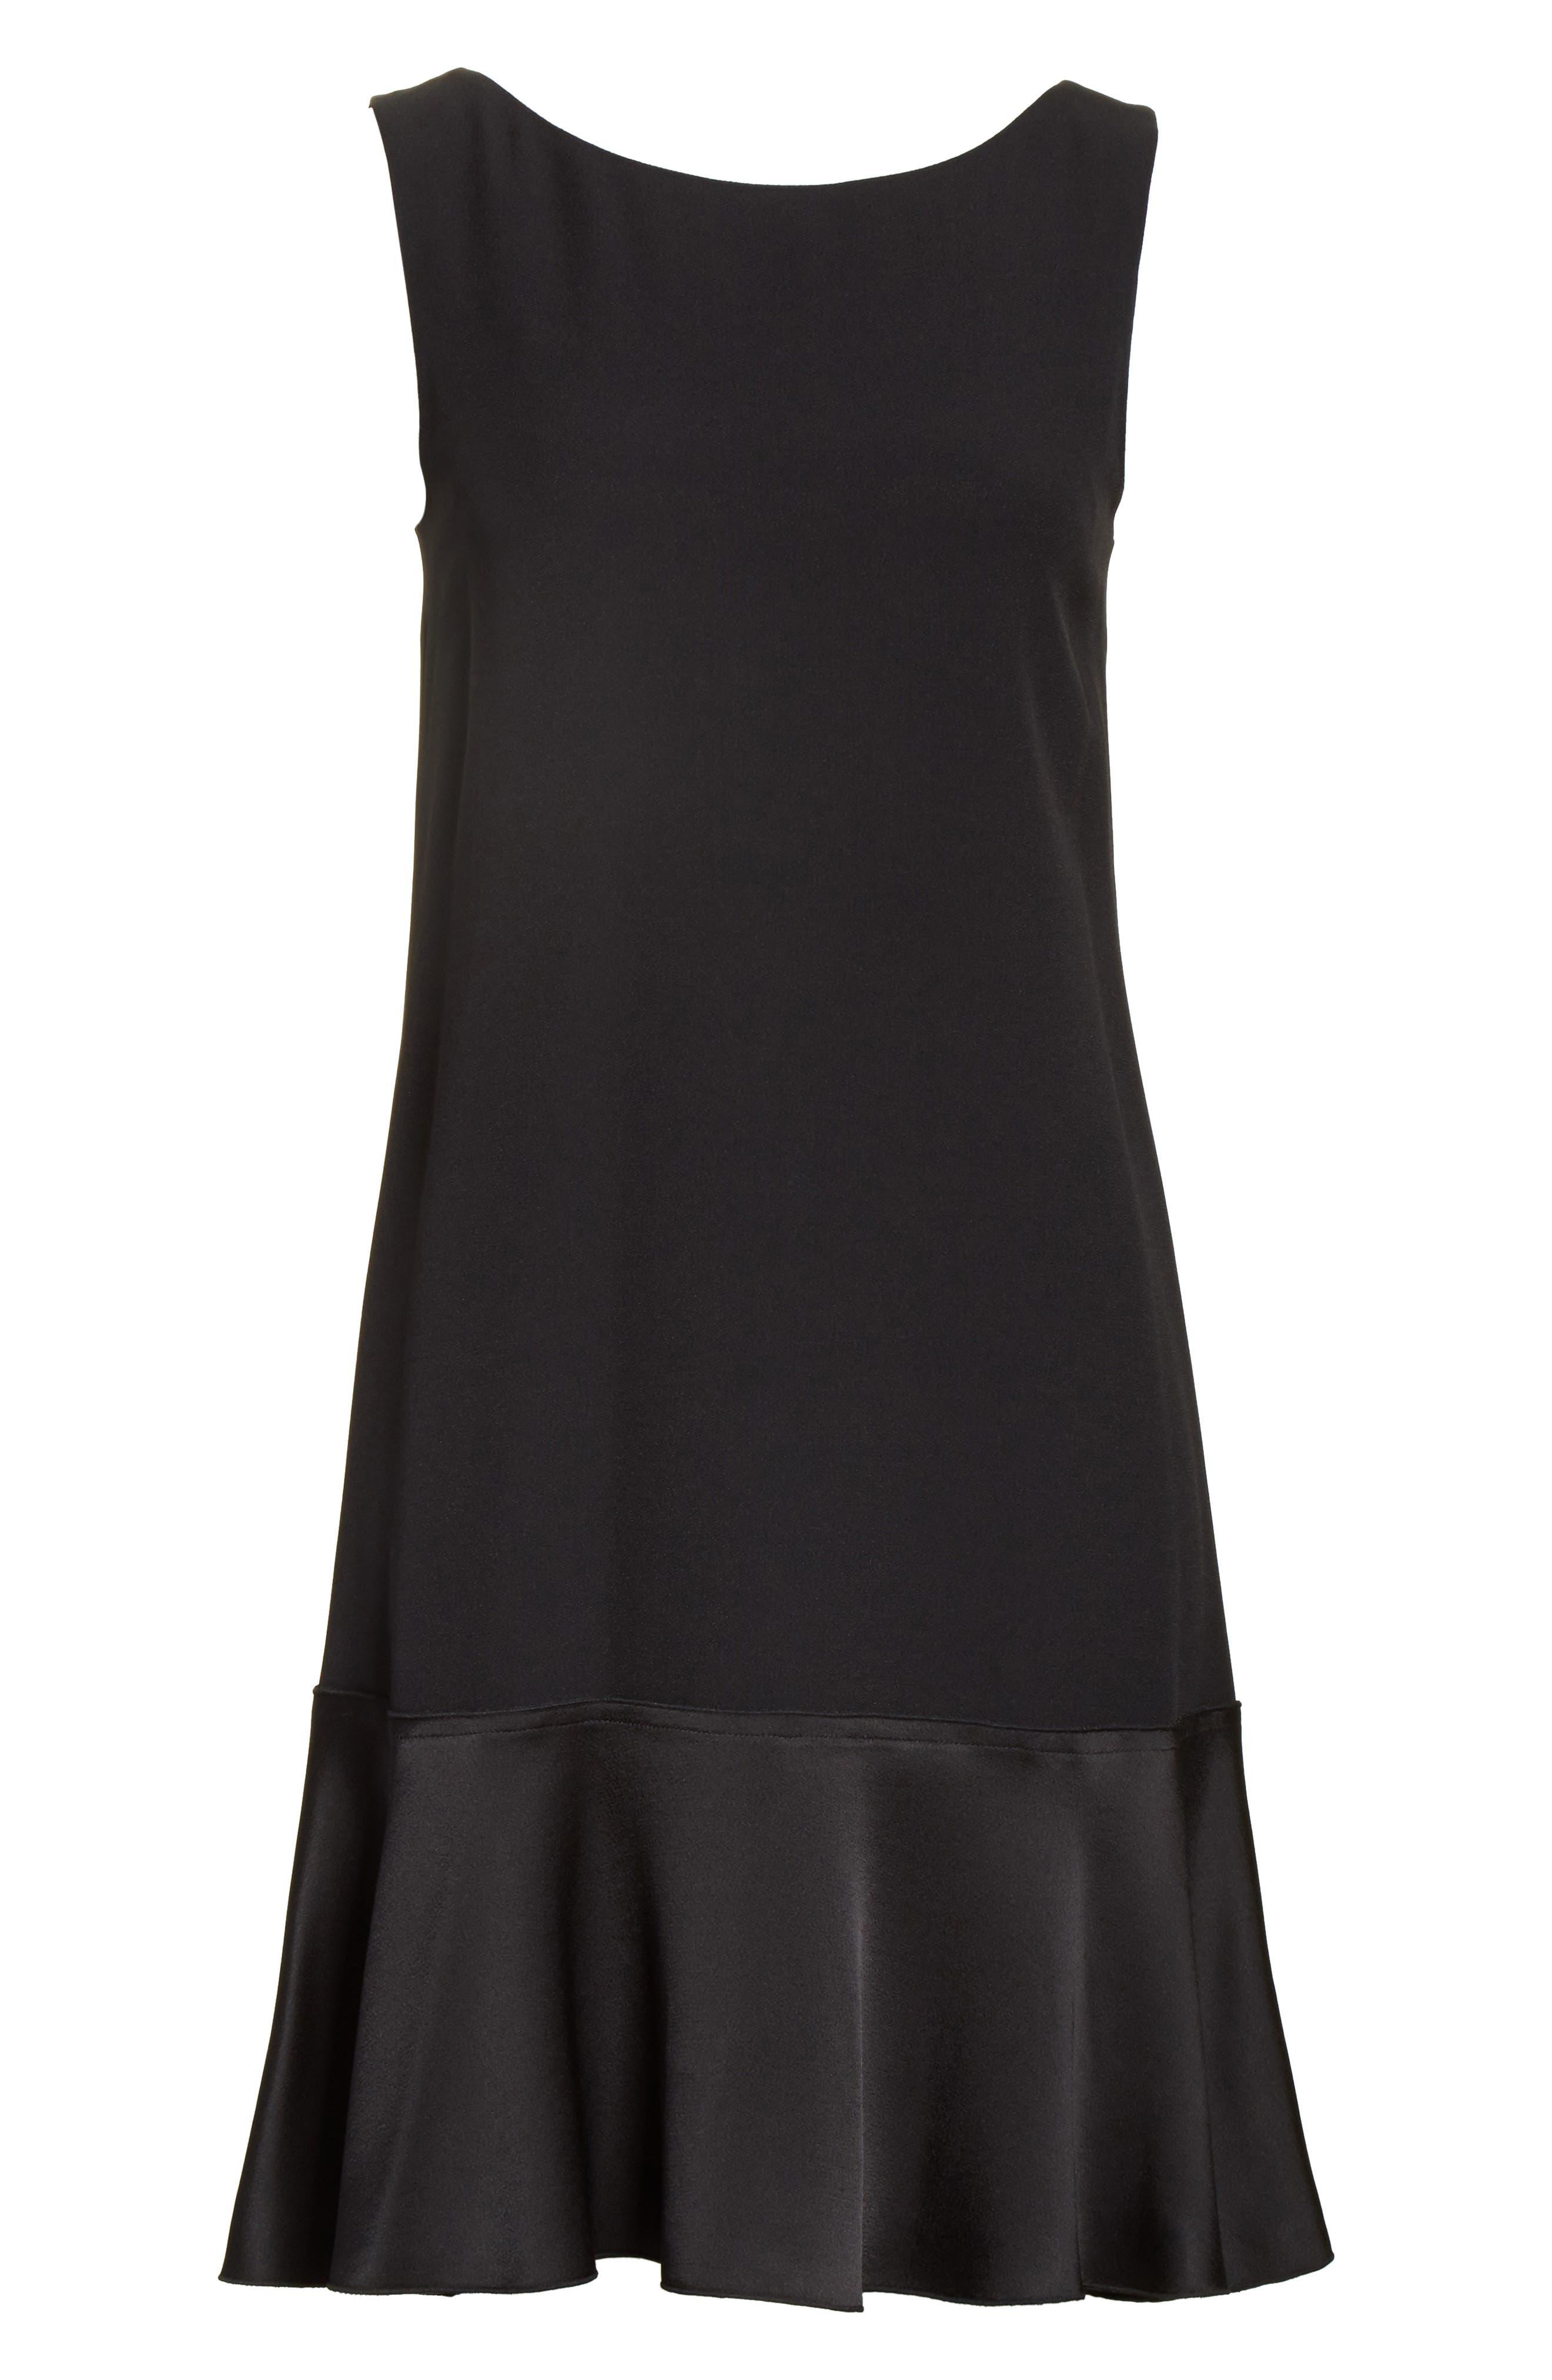 Kensington Flirty Flare Dress,                             Alternate thumbnail 6, color,                             Black